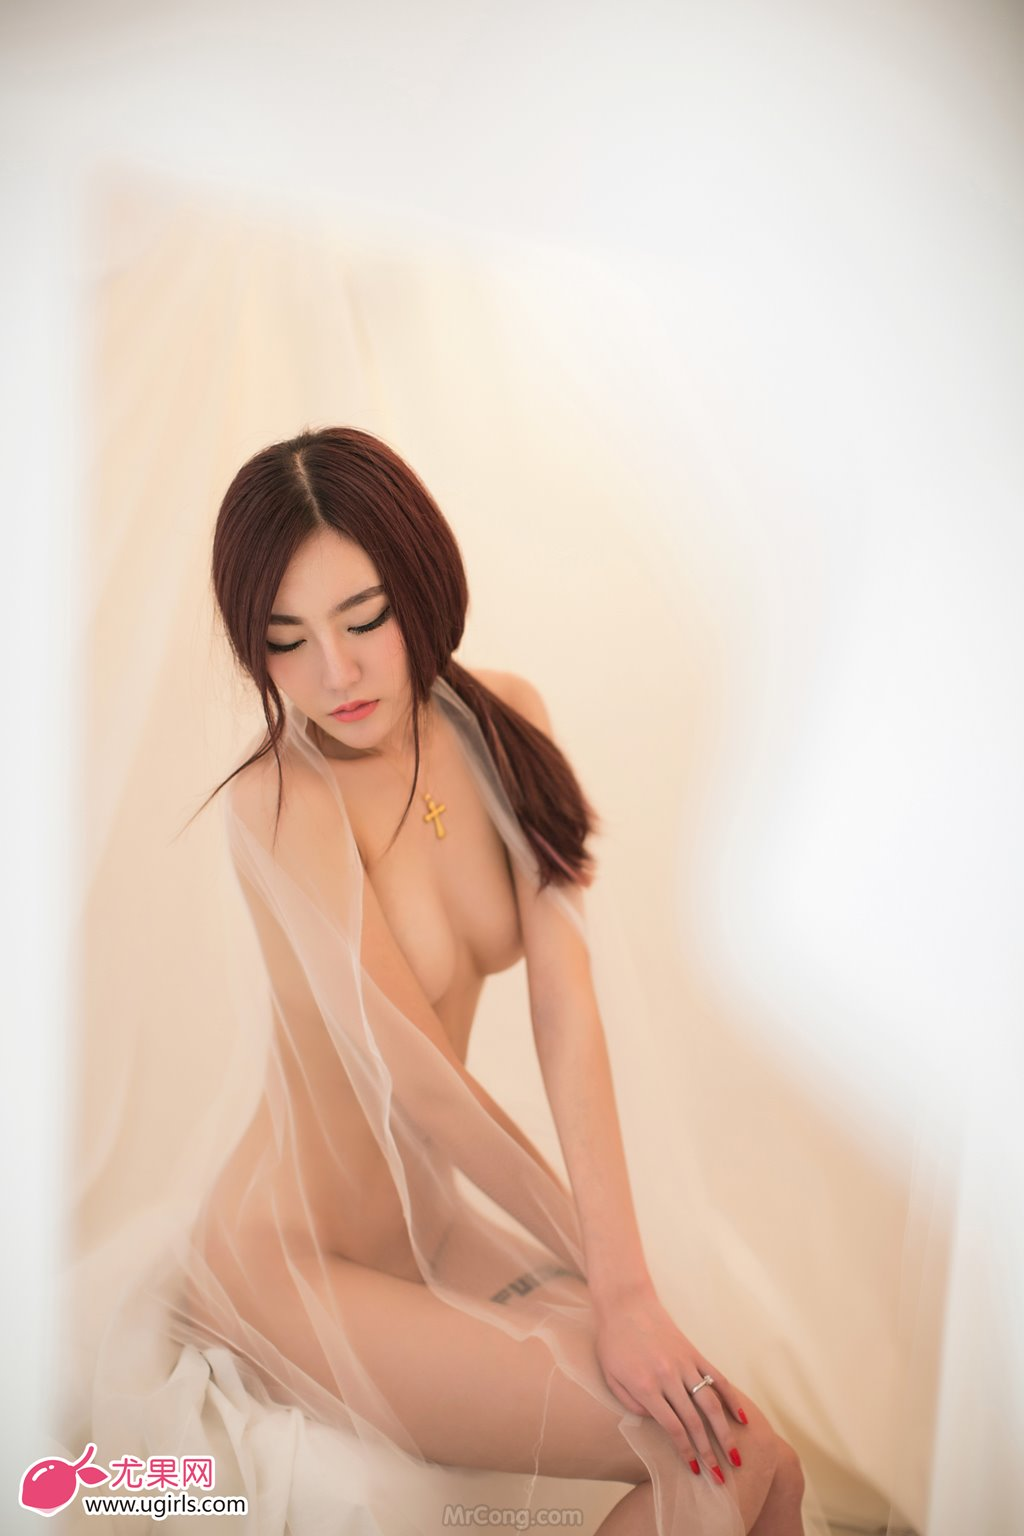 Image MrCong.com-UGIRLS-026-Guo-Wan-Qi-005 in post Người đẹp Guo Wan Qi (郭婉祈) gợi cảm trong bộ ảnh UGIRLS 026